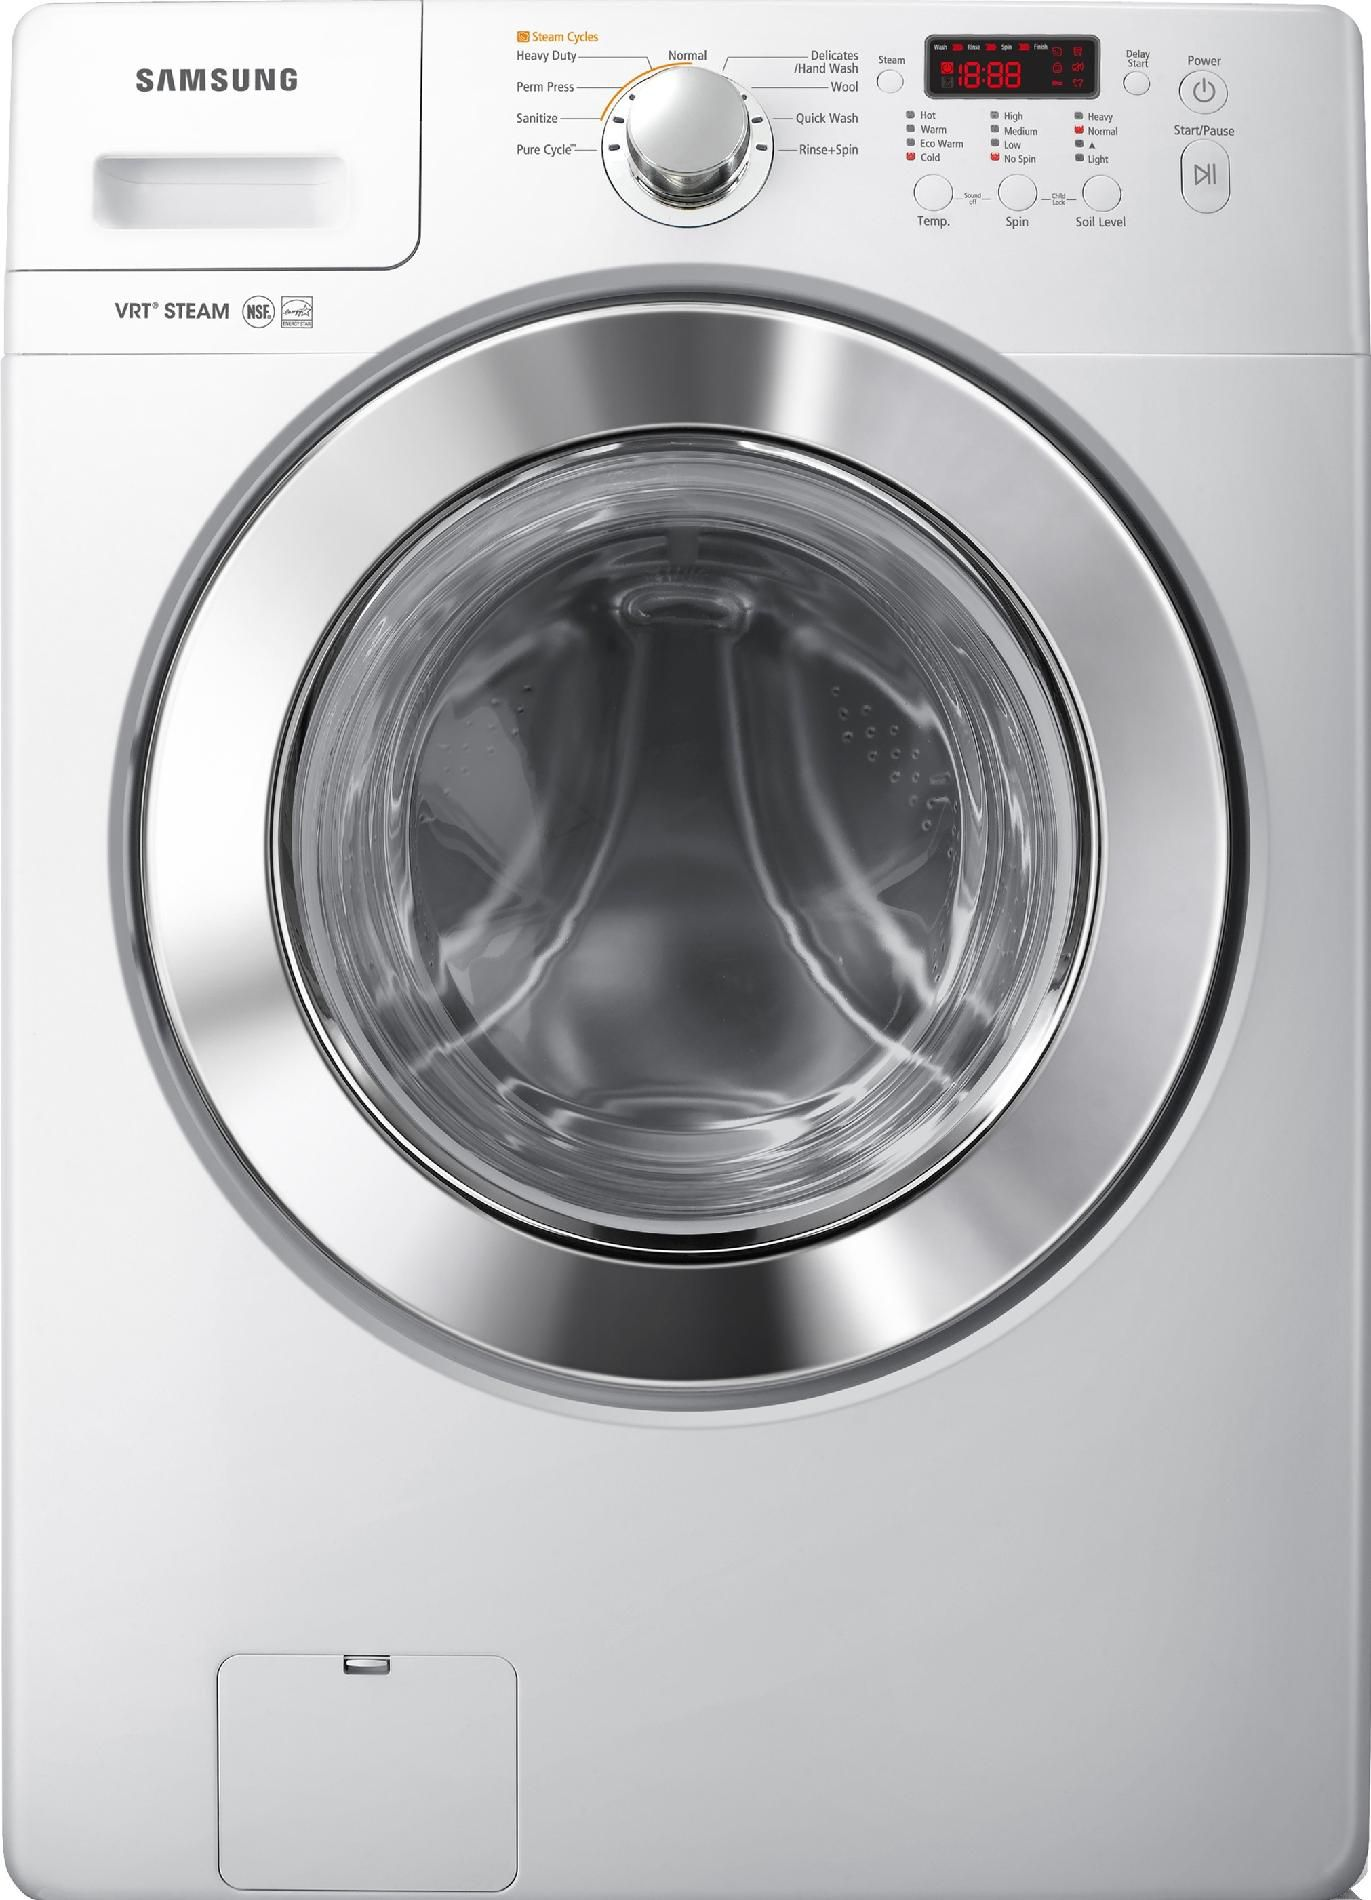 Samsung 3 6 Cu Ft Steam Front Load Washer White Shop